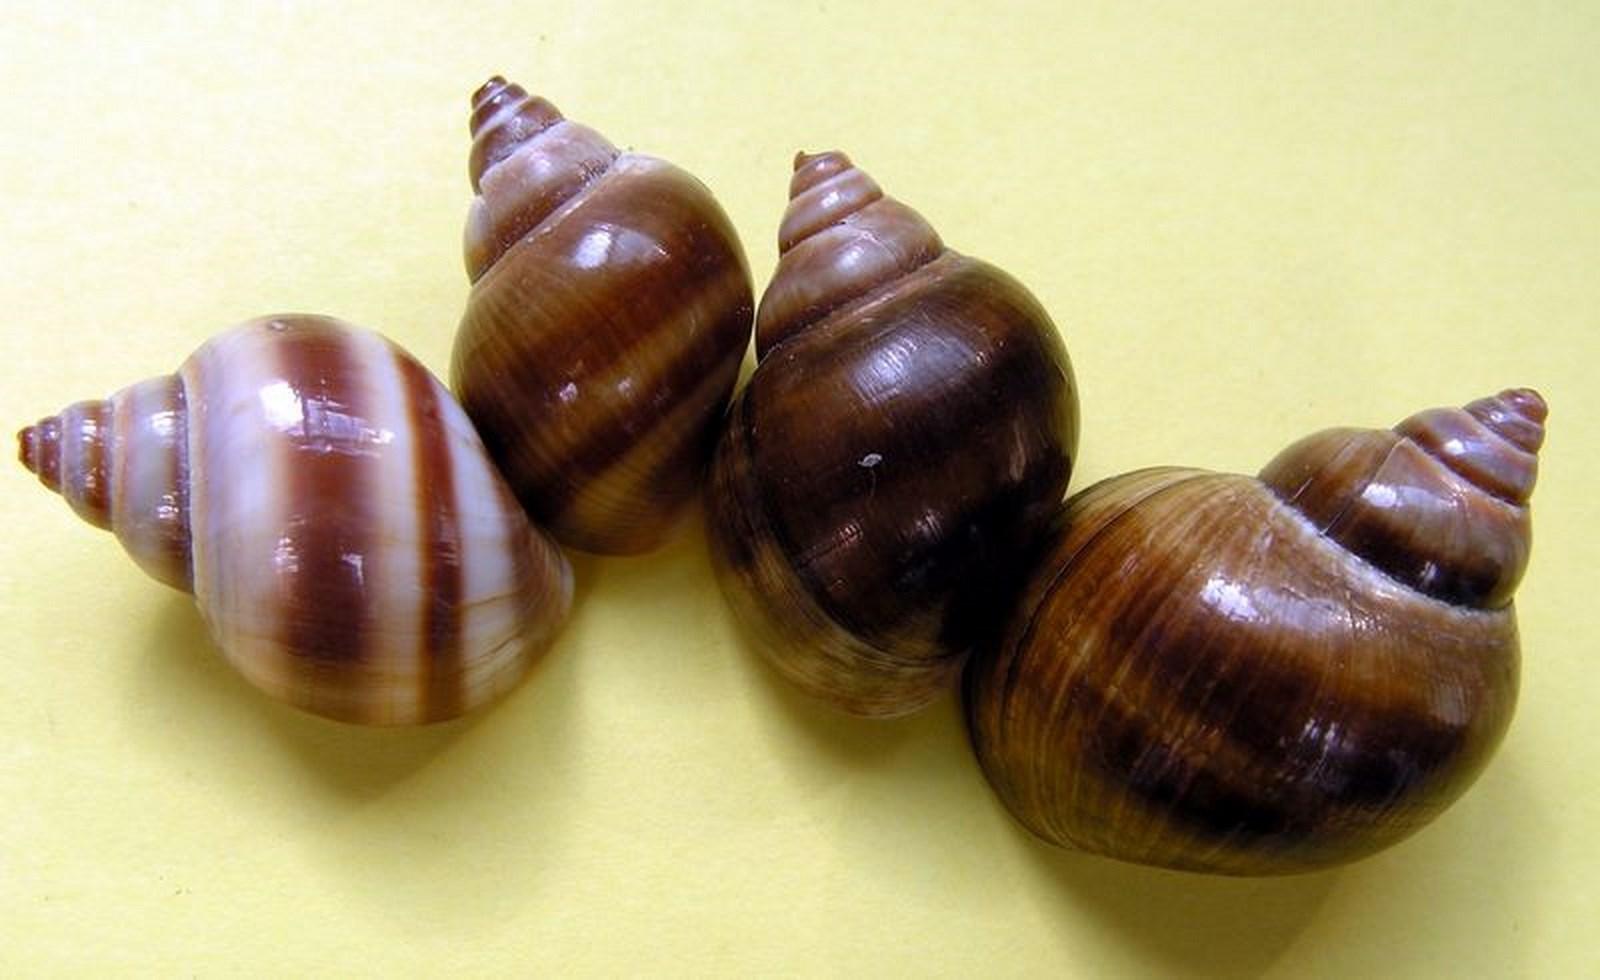 Balanocochlis glandiformis - (Schepman, 1896) à confirmer Vivivp10